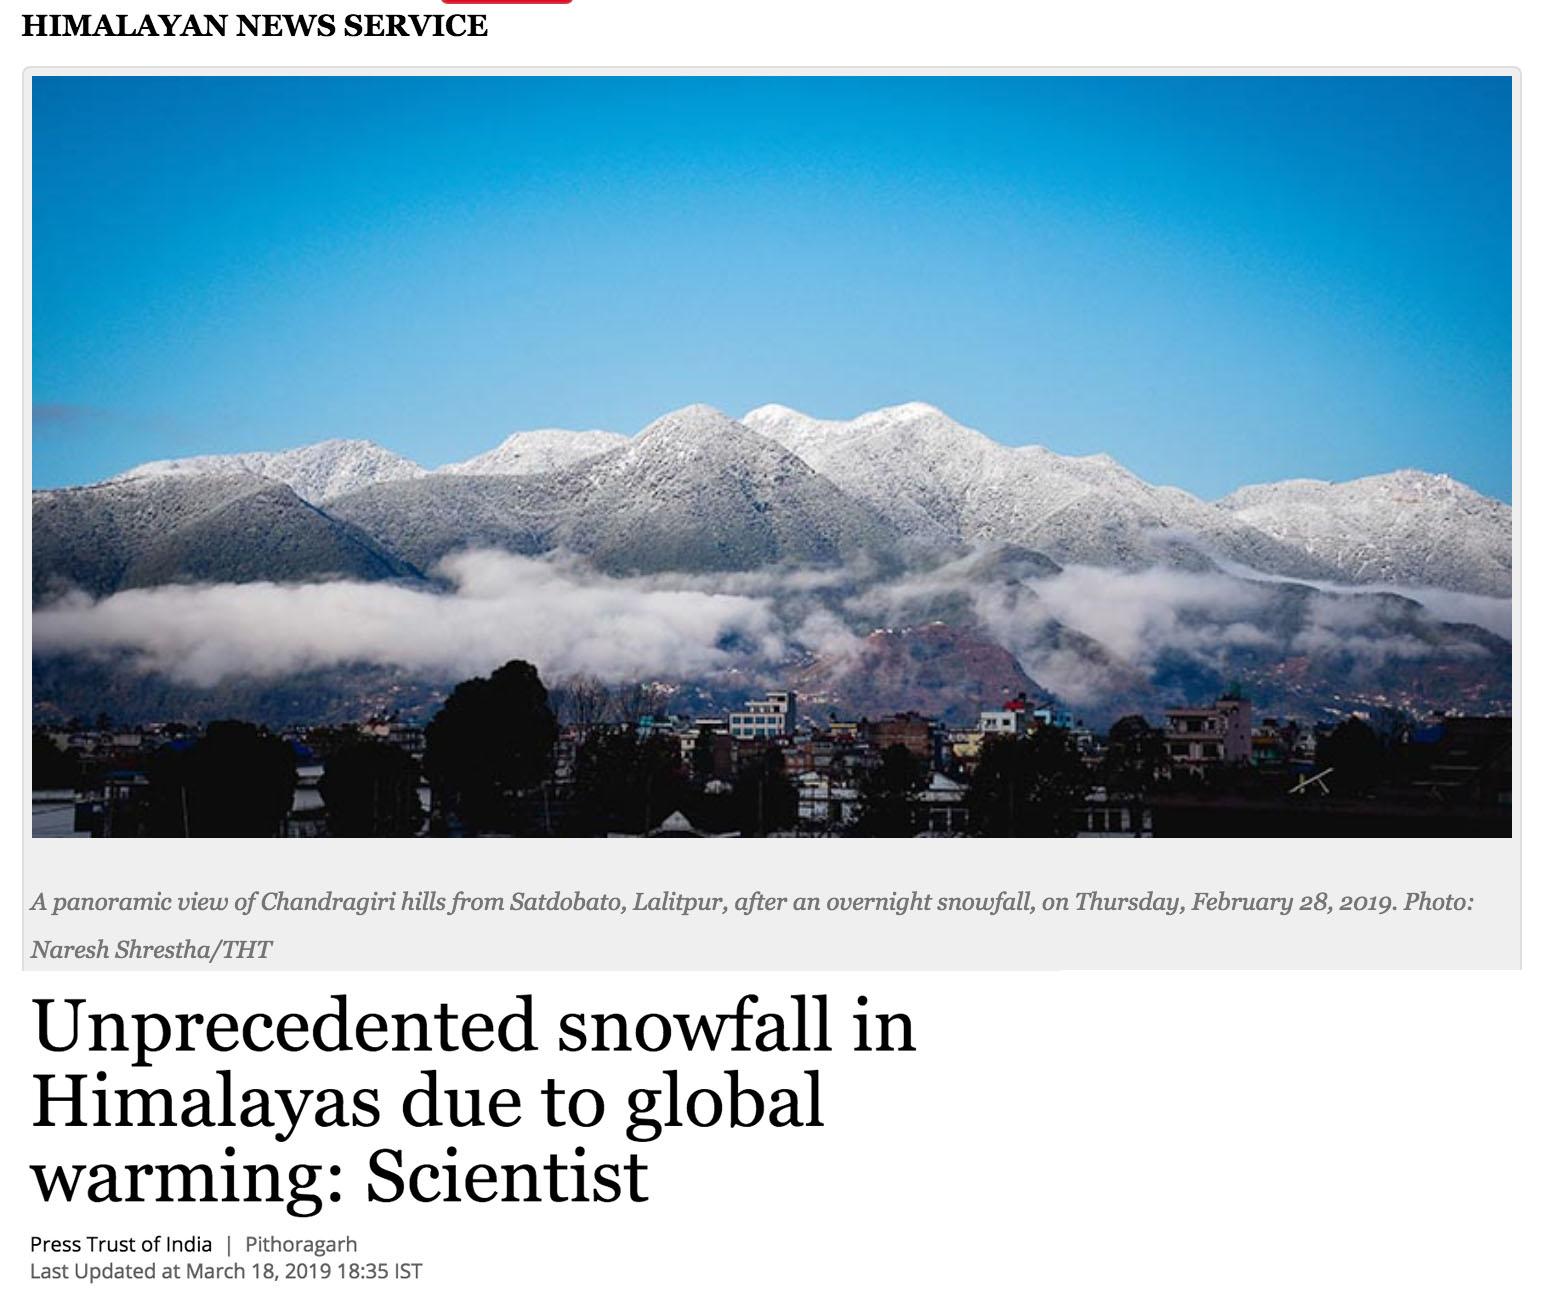 climatechangedispatch.com - Record Snowfall Across Himalayas Blamed On … Global Warming